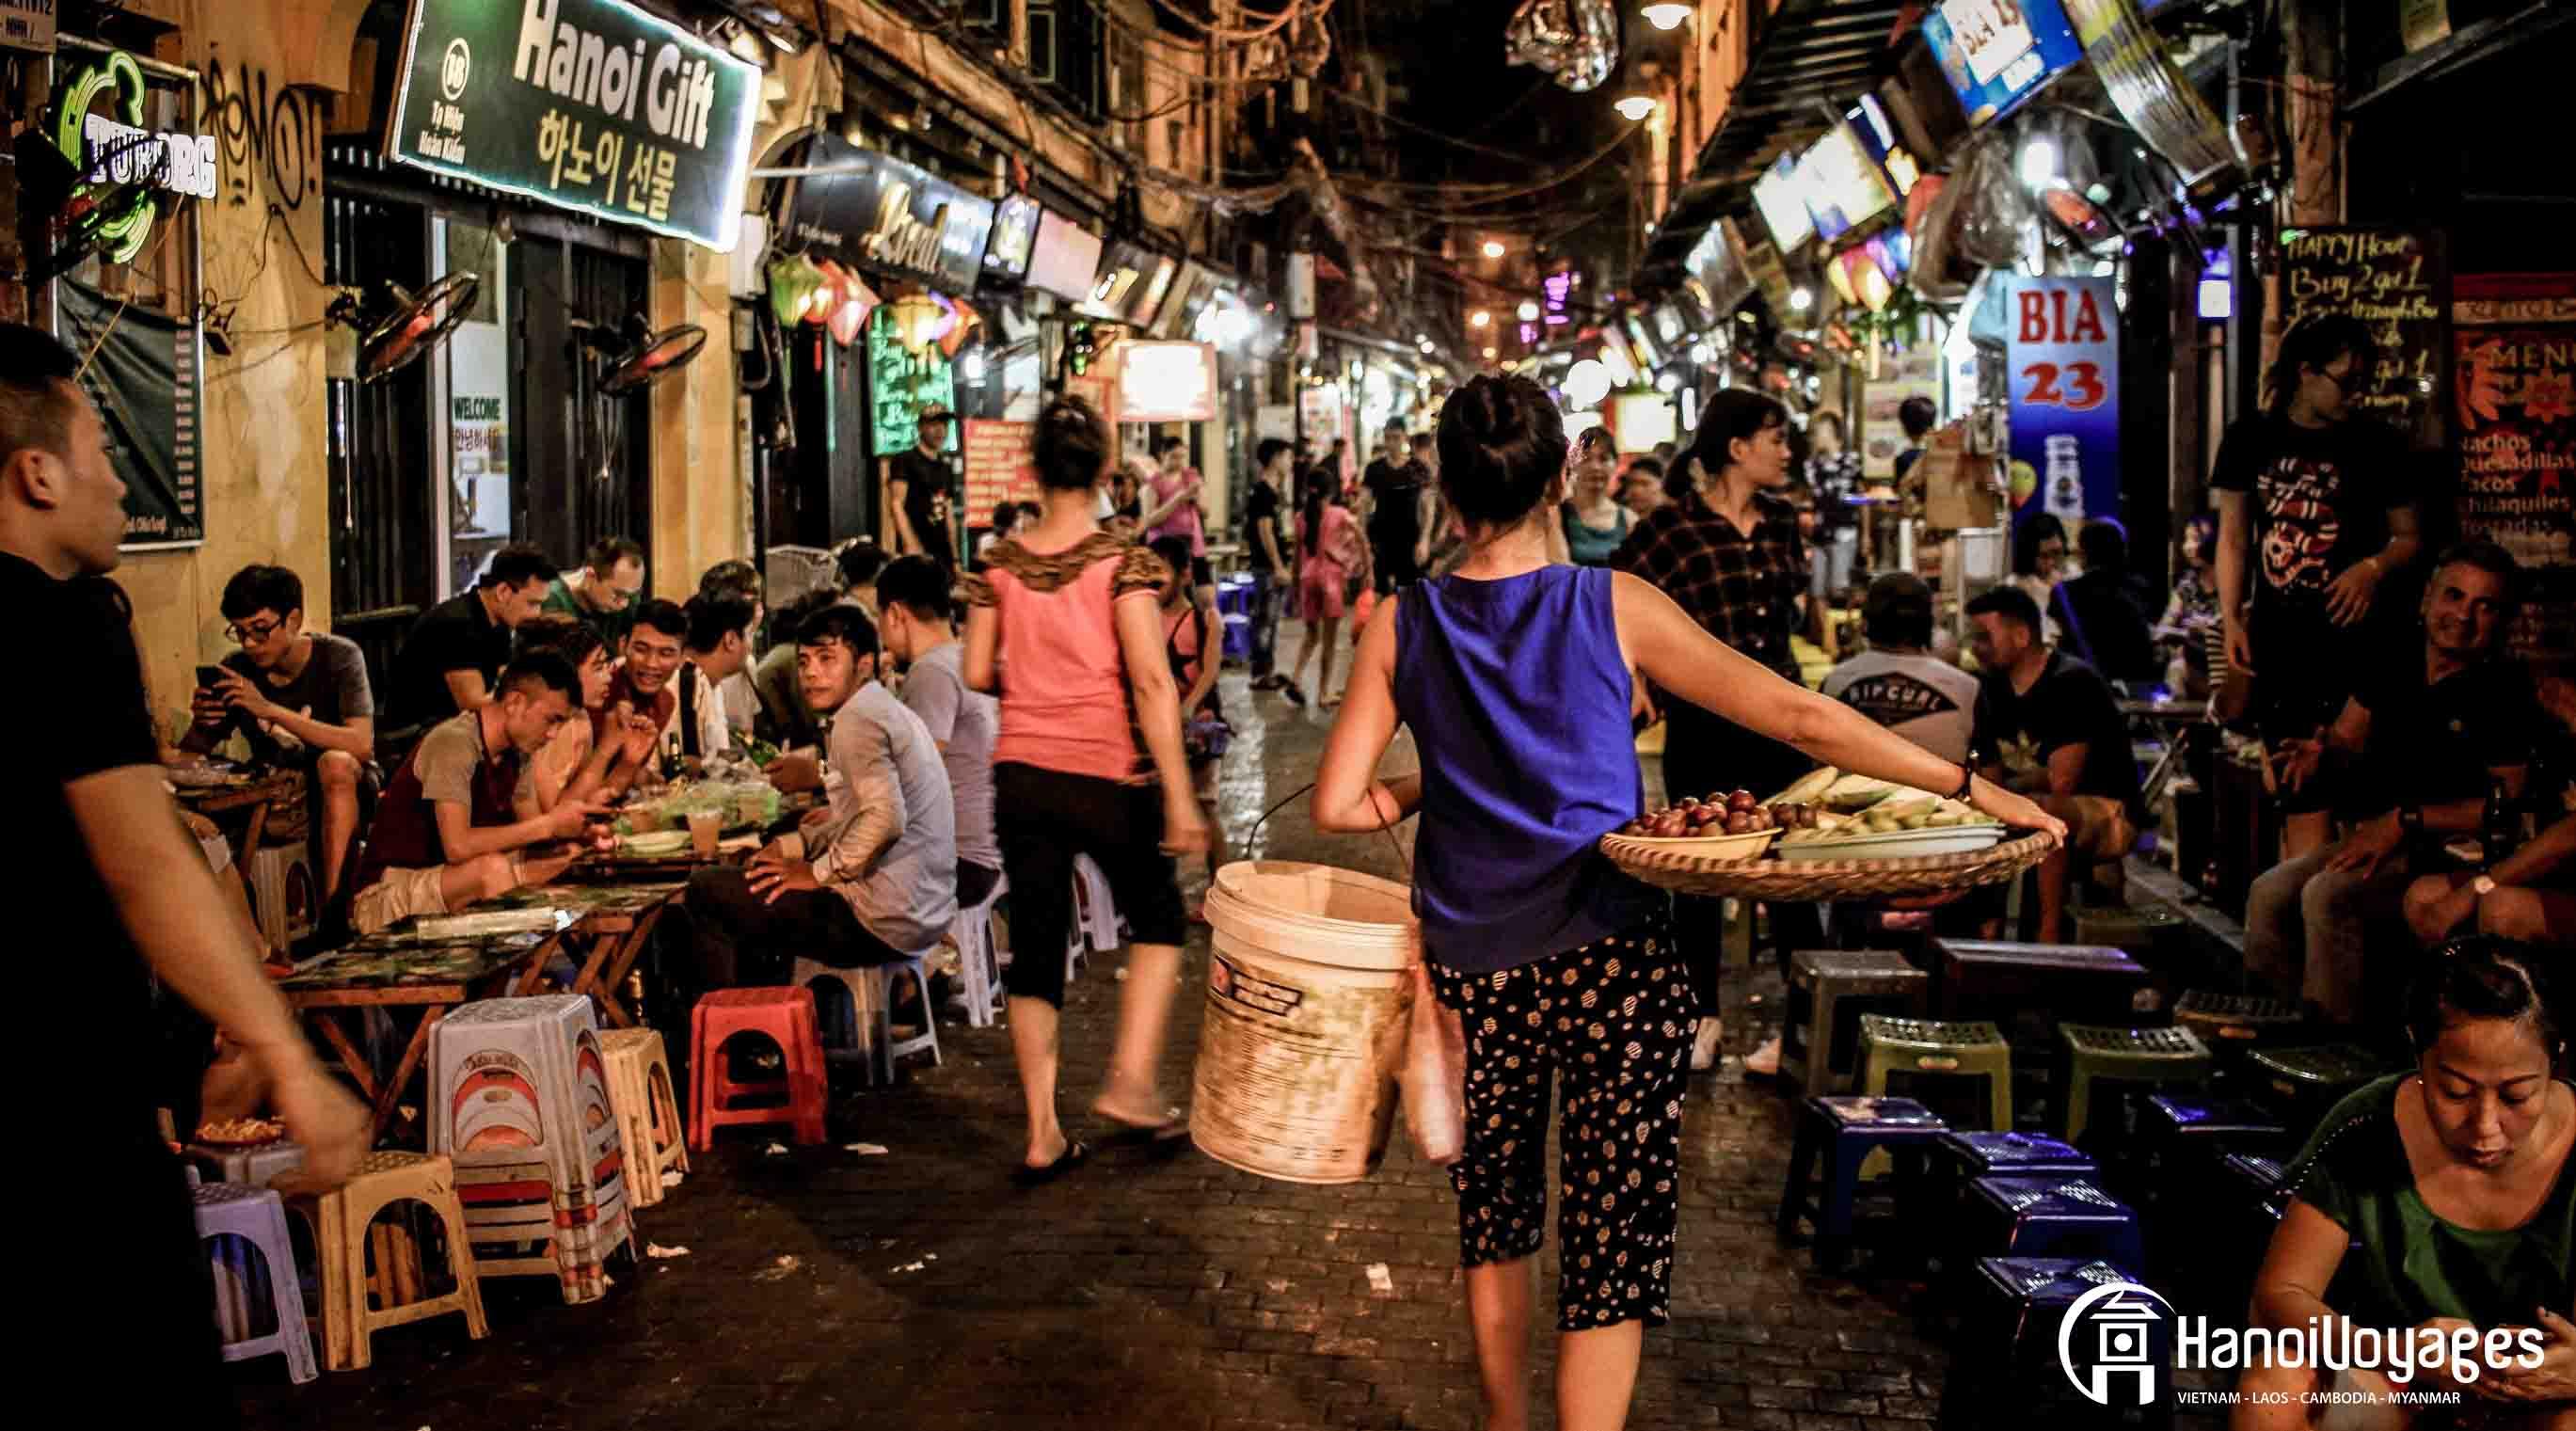 Vieux quartier - Âme du Vietnam